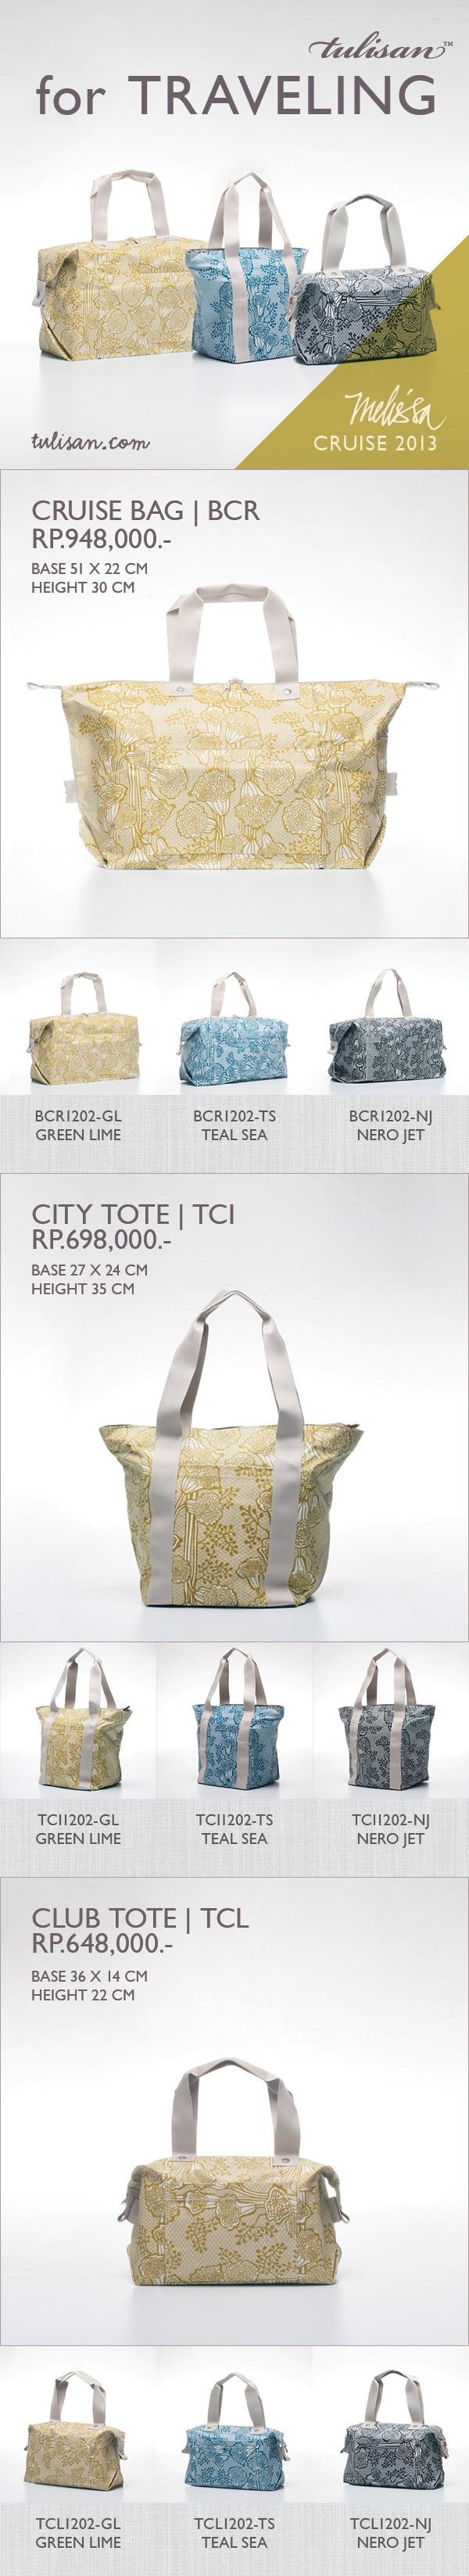 #Tulisan #Cruise #City #Bag #Club #Tote #duffel #foldable #travel #canvas #prints #illustration